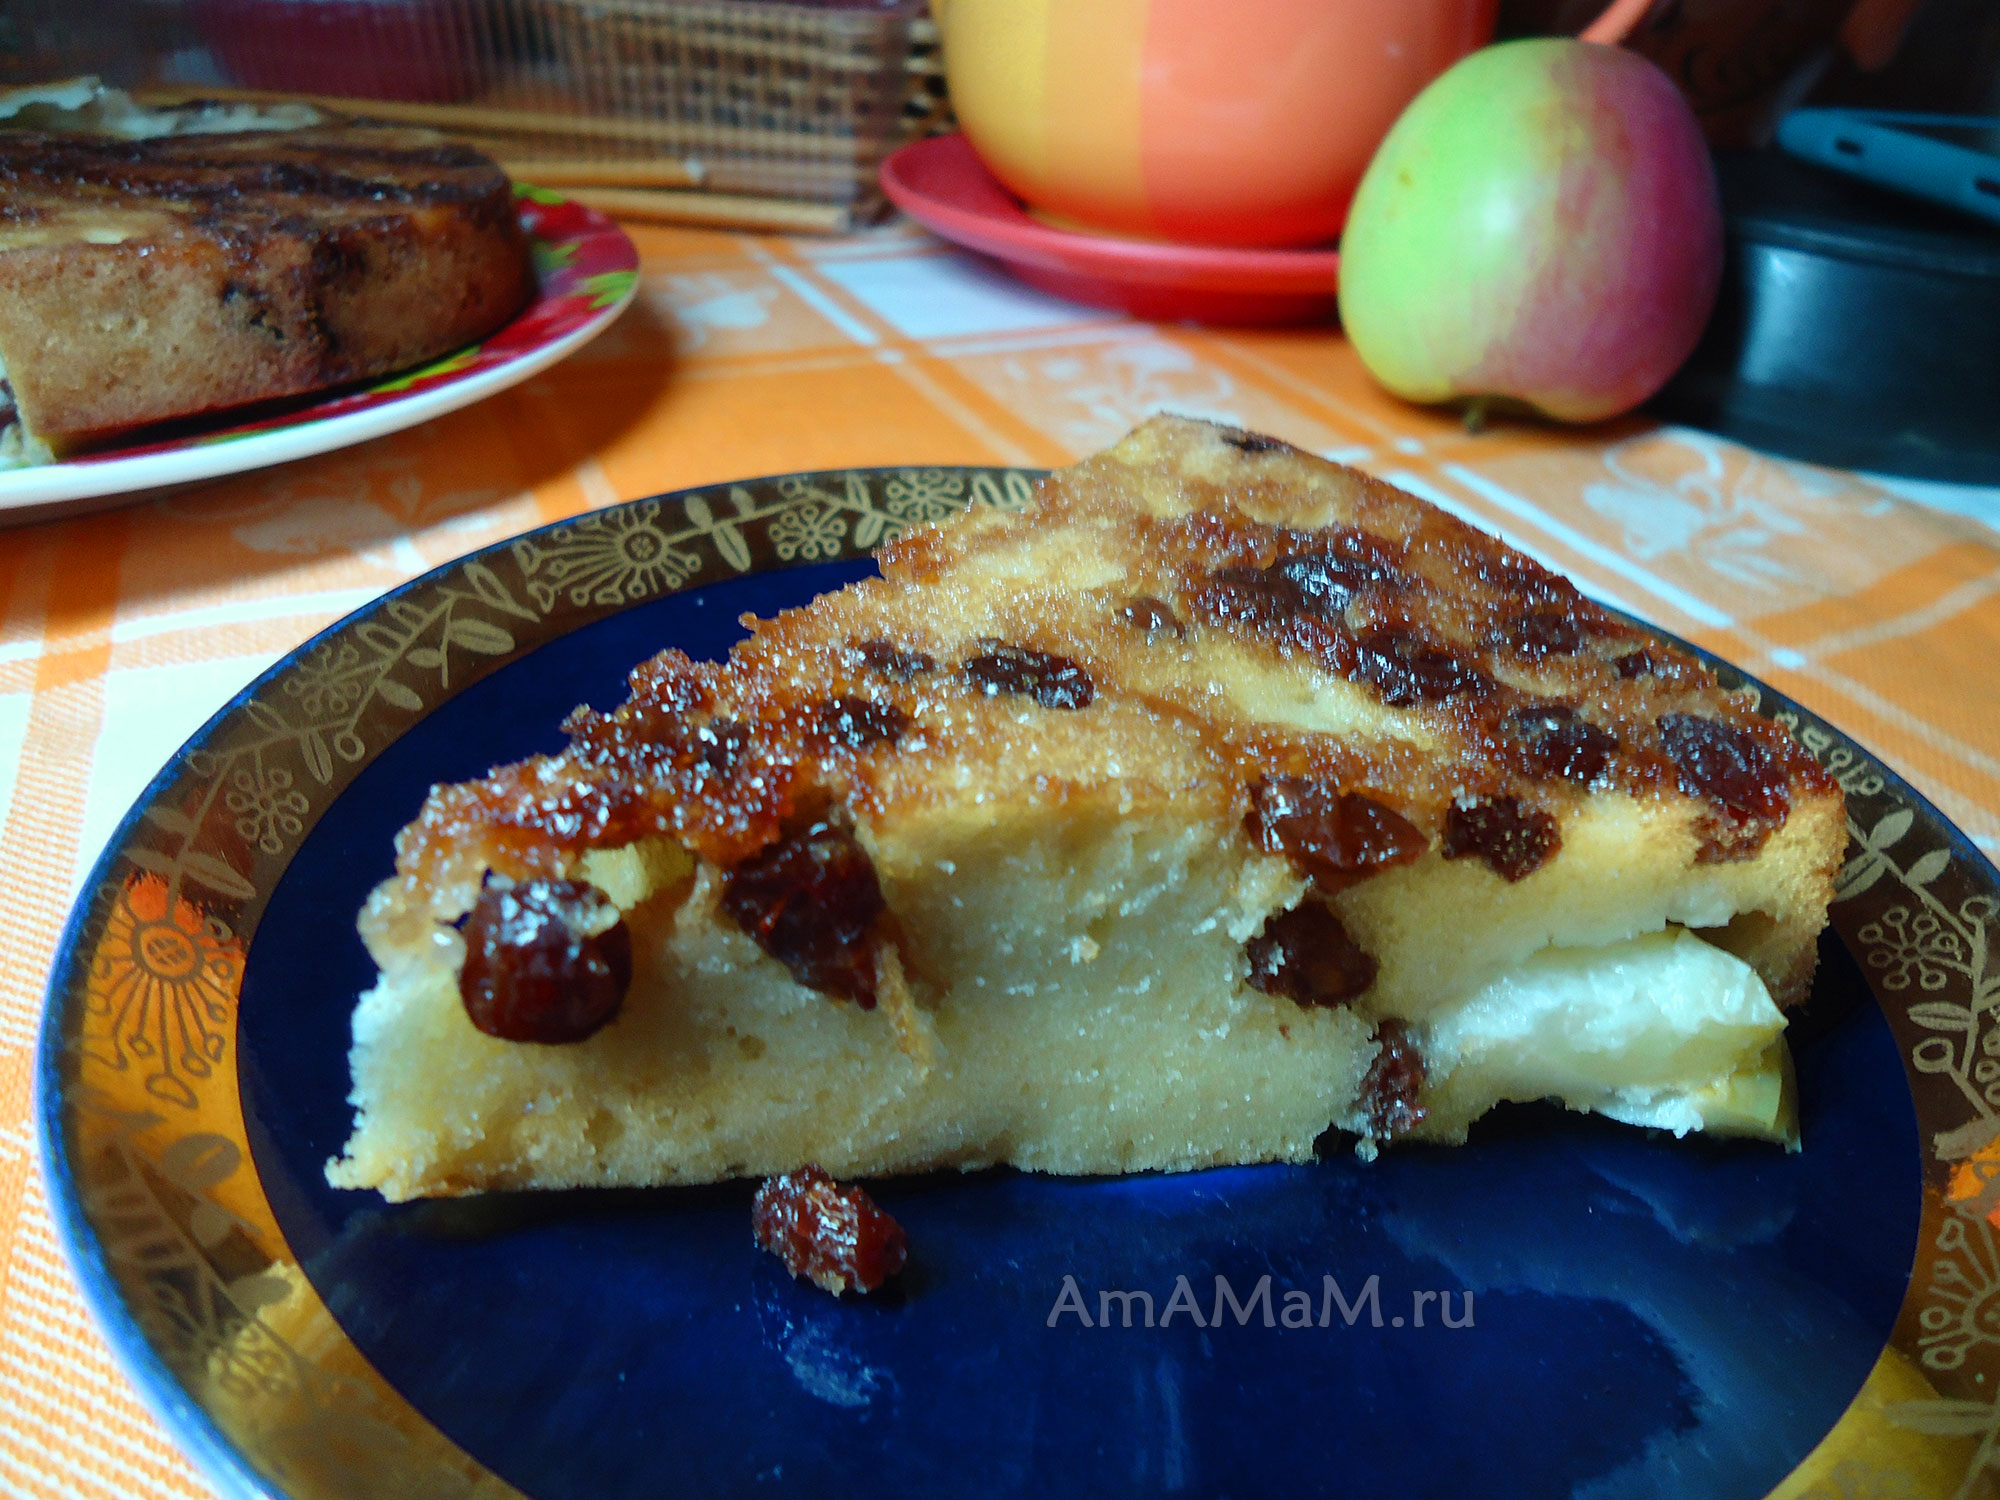 пирог с яблоками и изюмом рецепт с фото